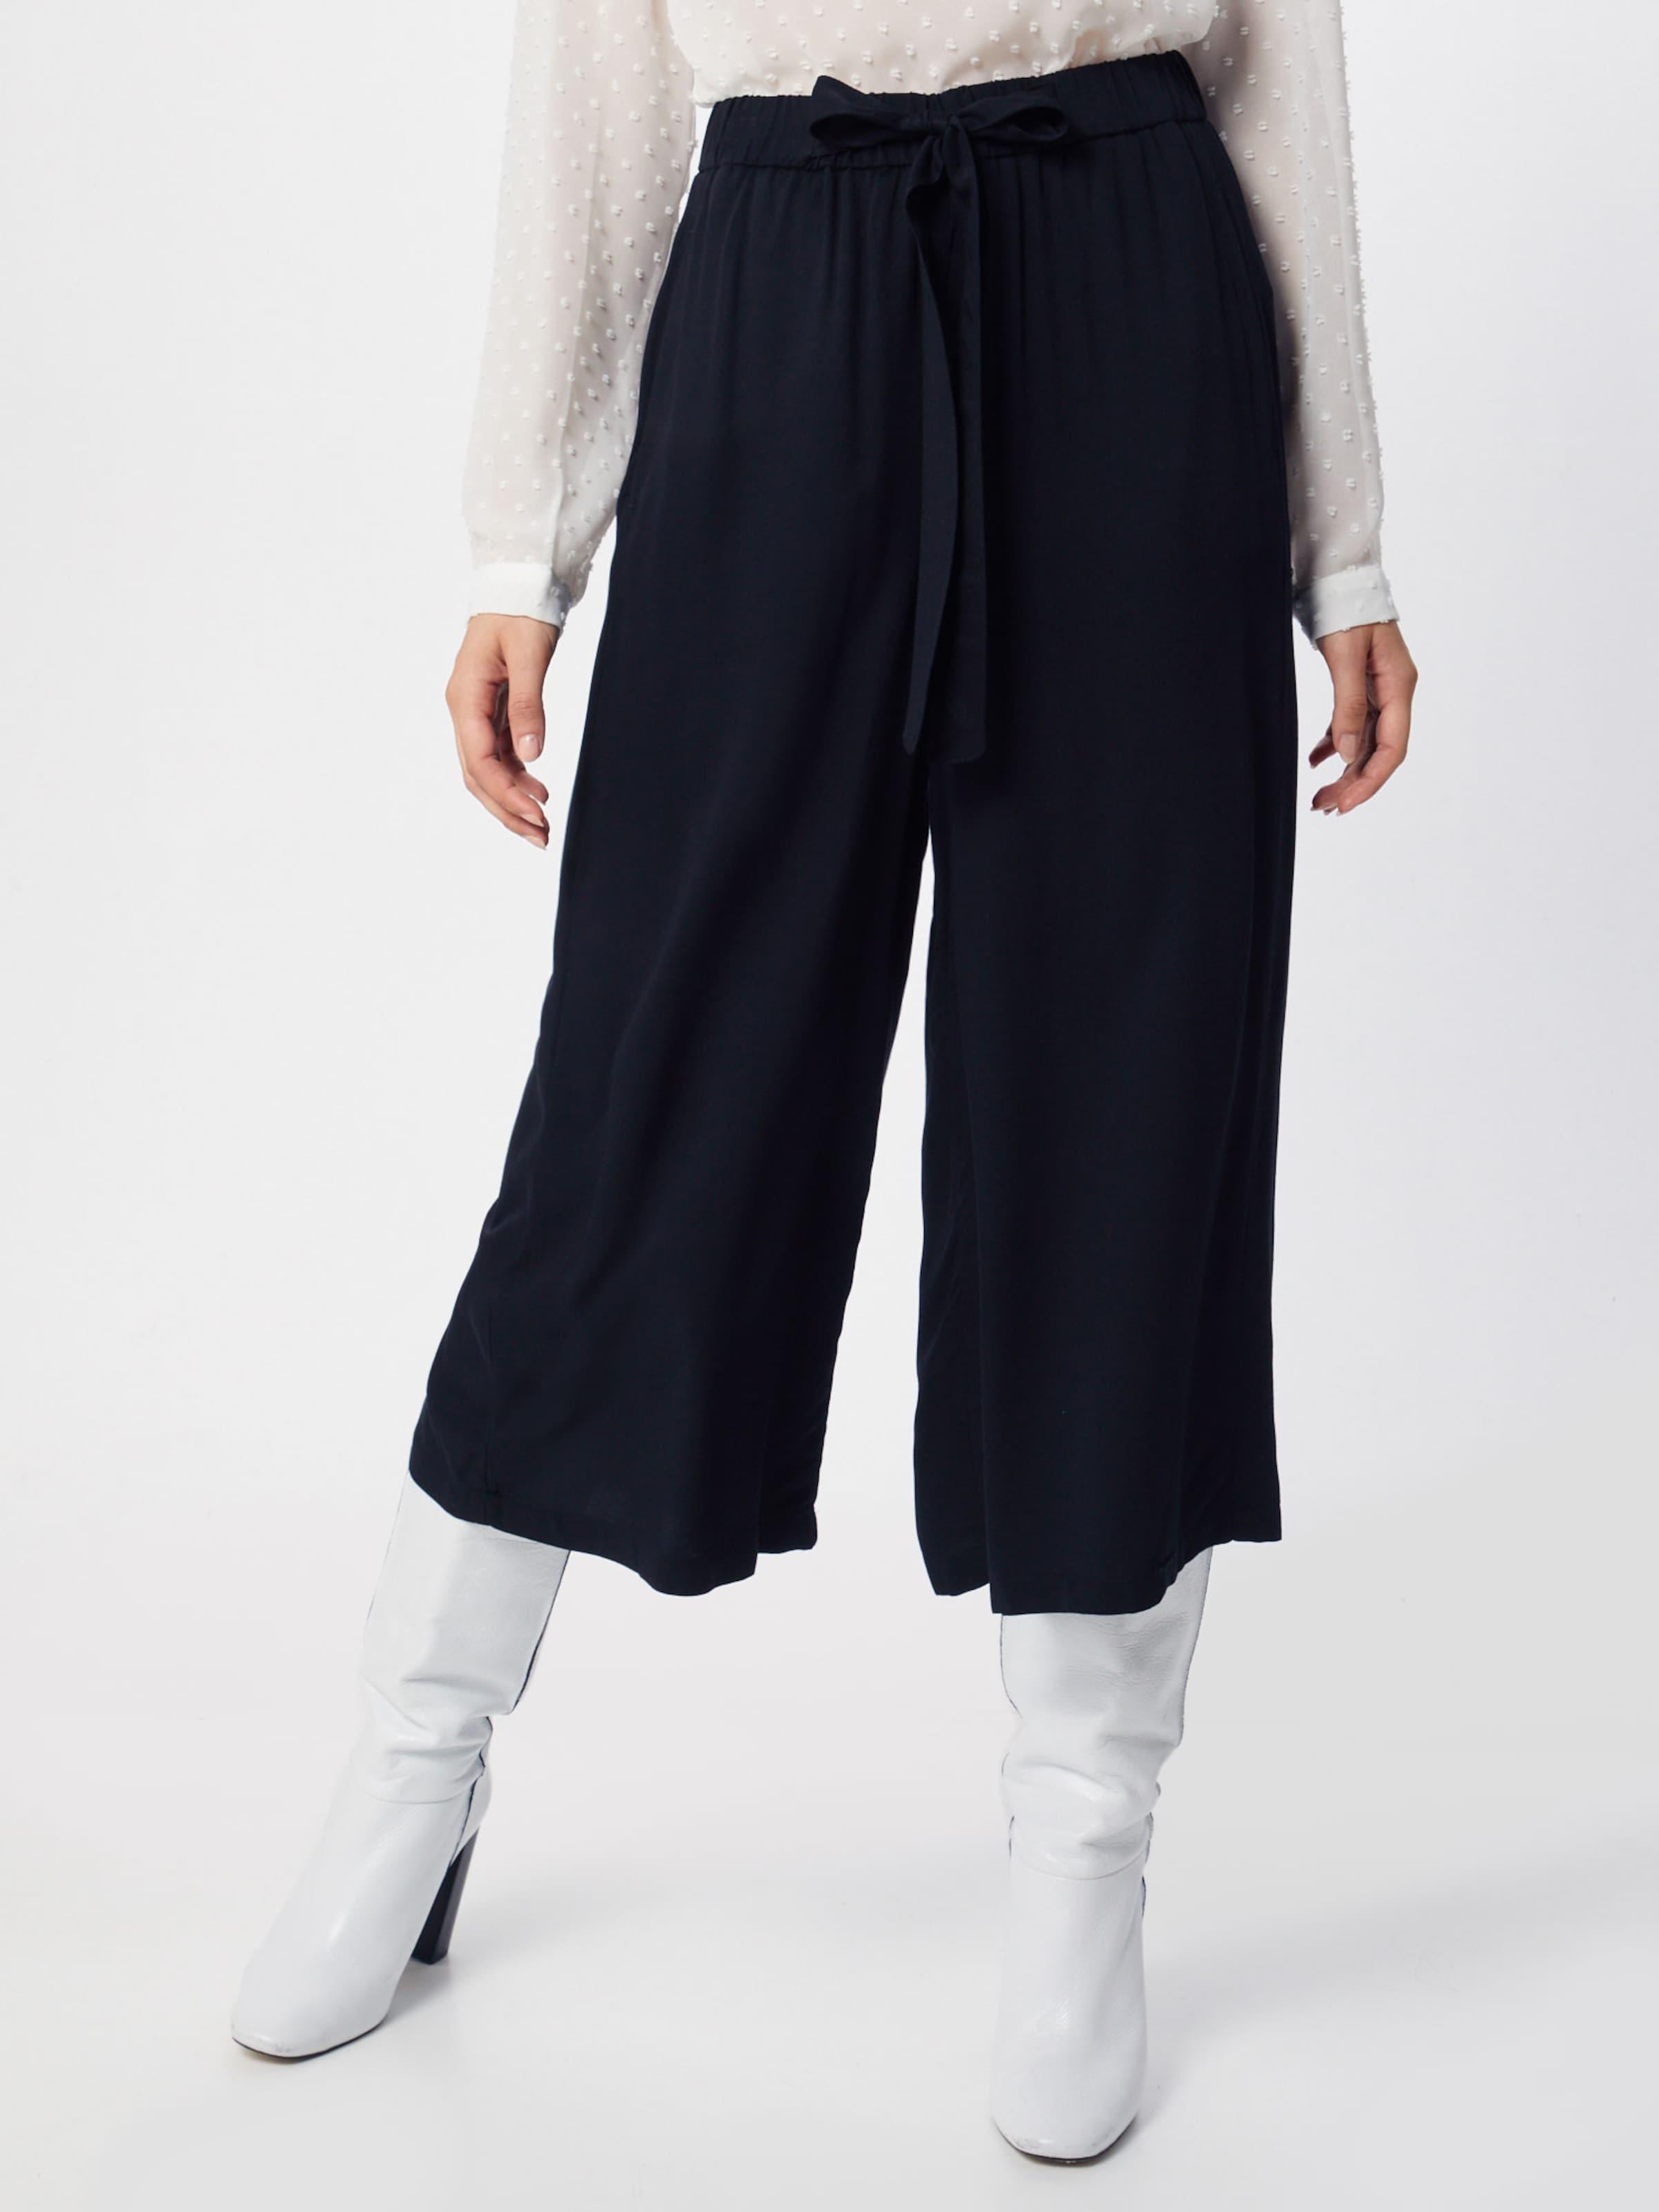 En Mavi Pantalon Noir 'drawstring' 'drawstring' Mavi Pantalon 3RL5jqcAS4